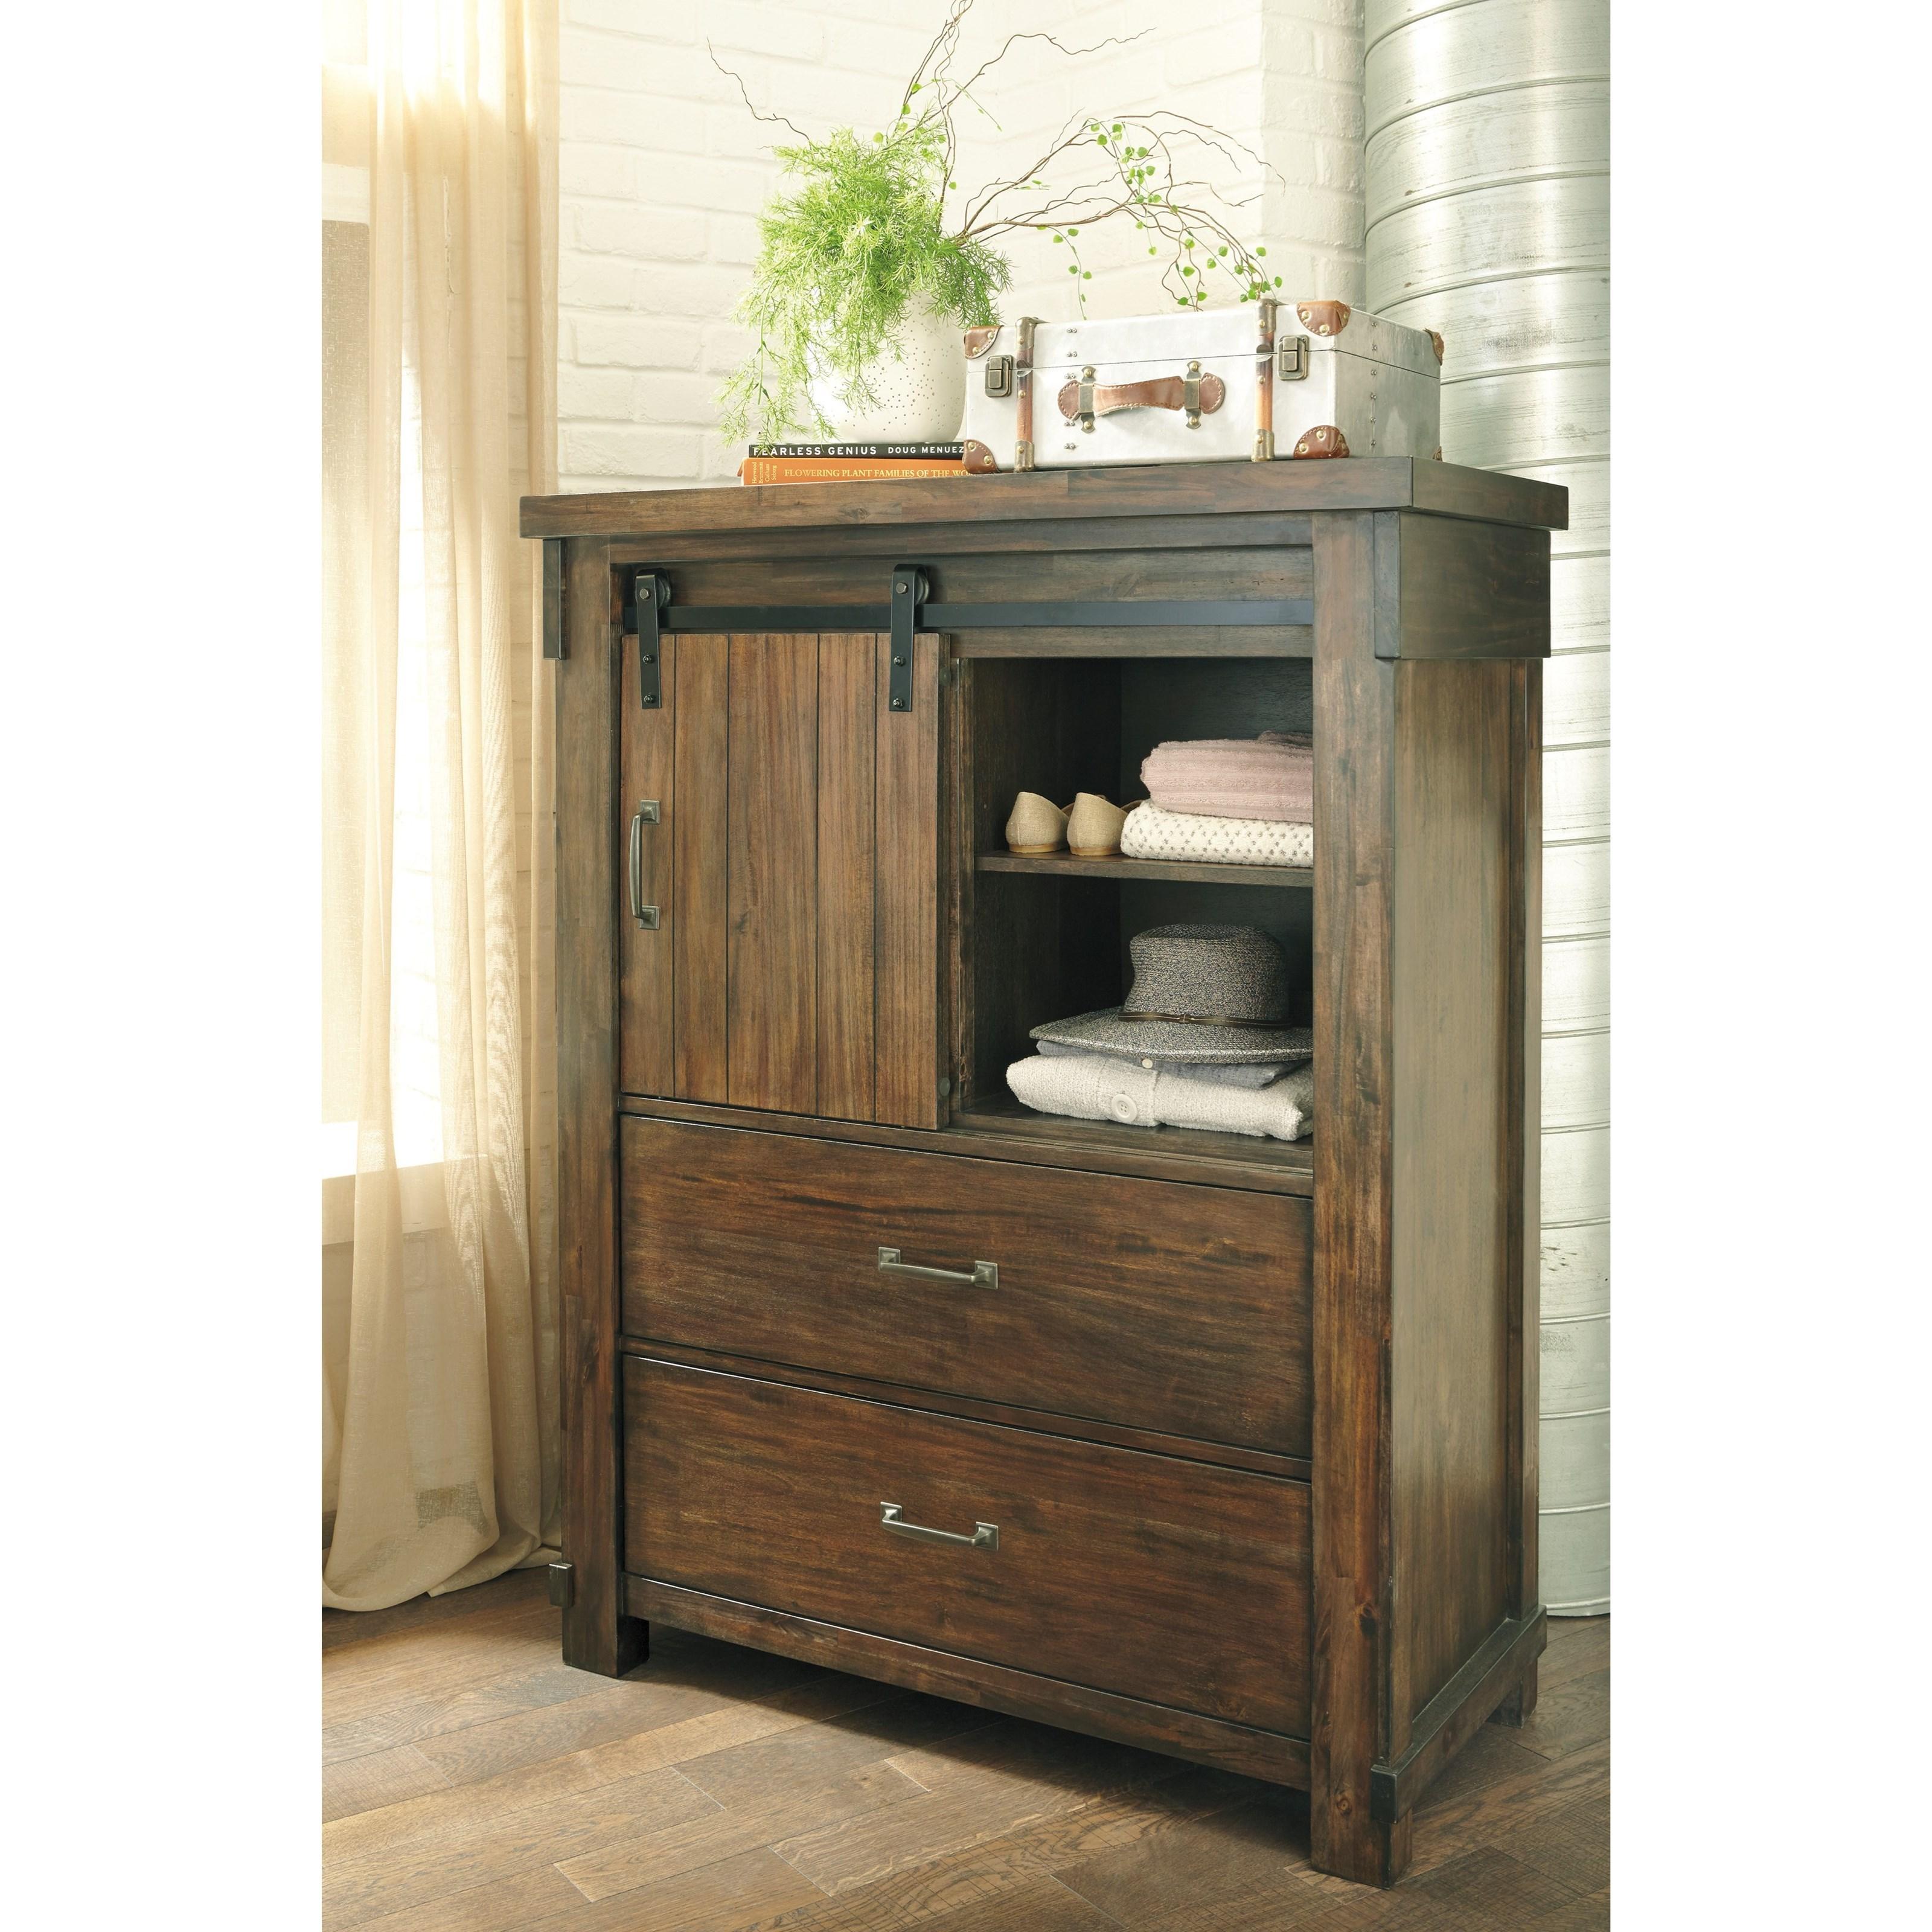 cabinet media by custommade karl door mkarl made barn barns com furniture custom hand m llc